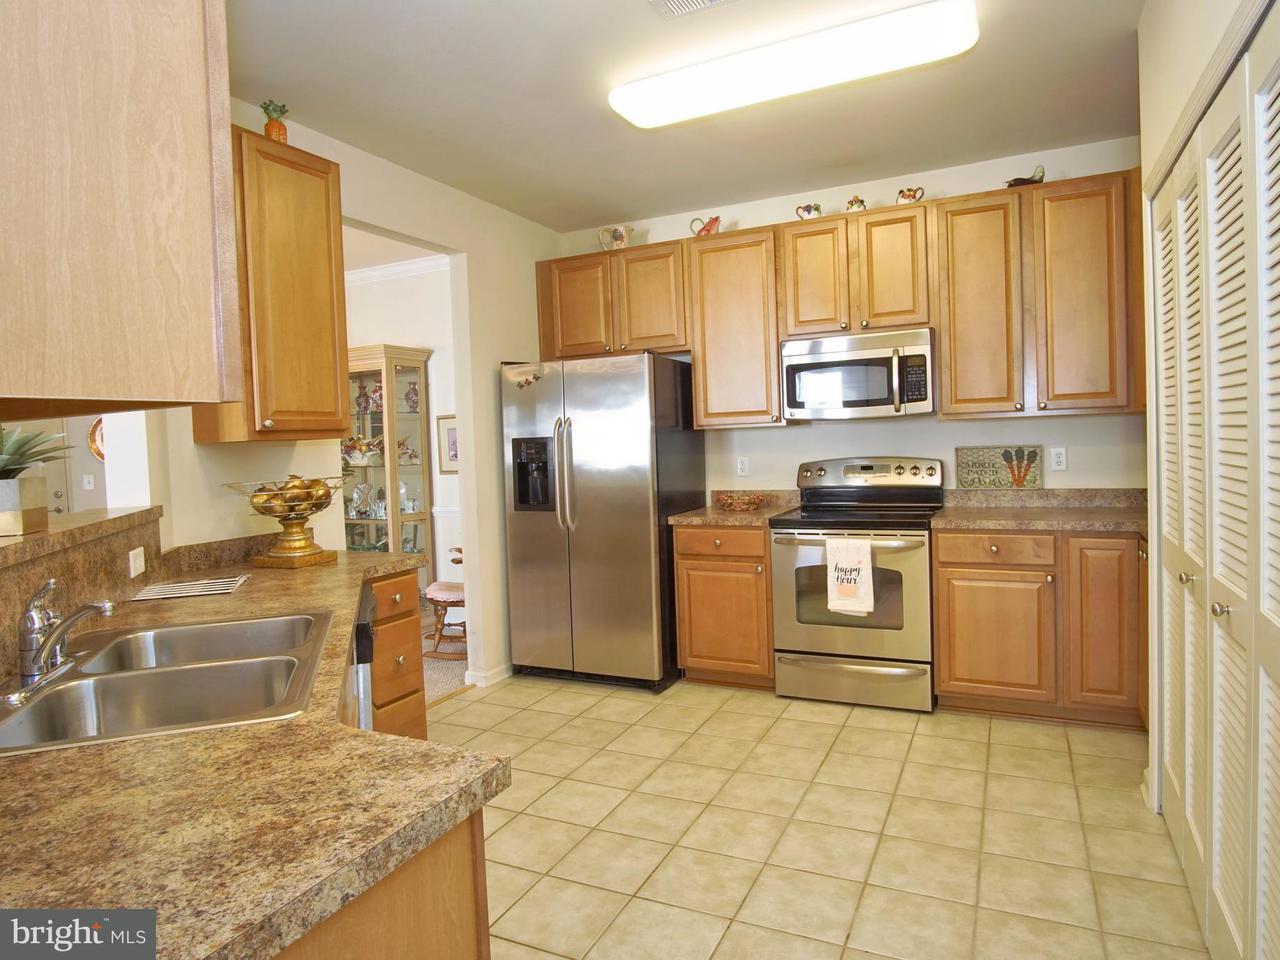 Condominium for Sale at 5301 Wyndholme Cir #302 Baltimore, Maryland 21229 United States